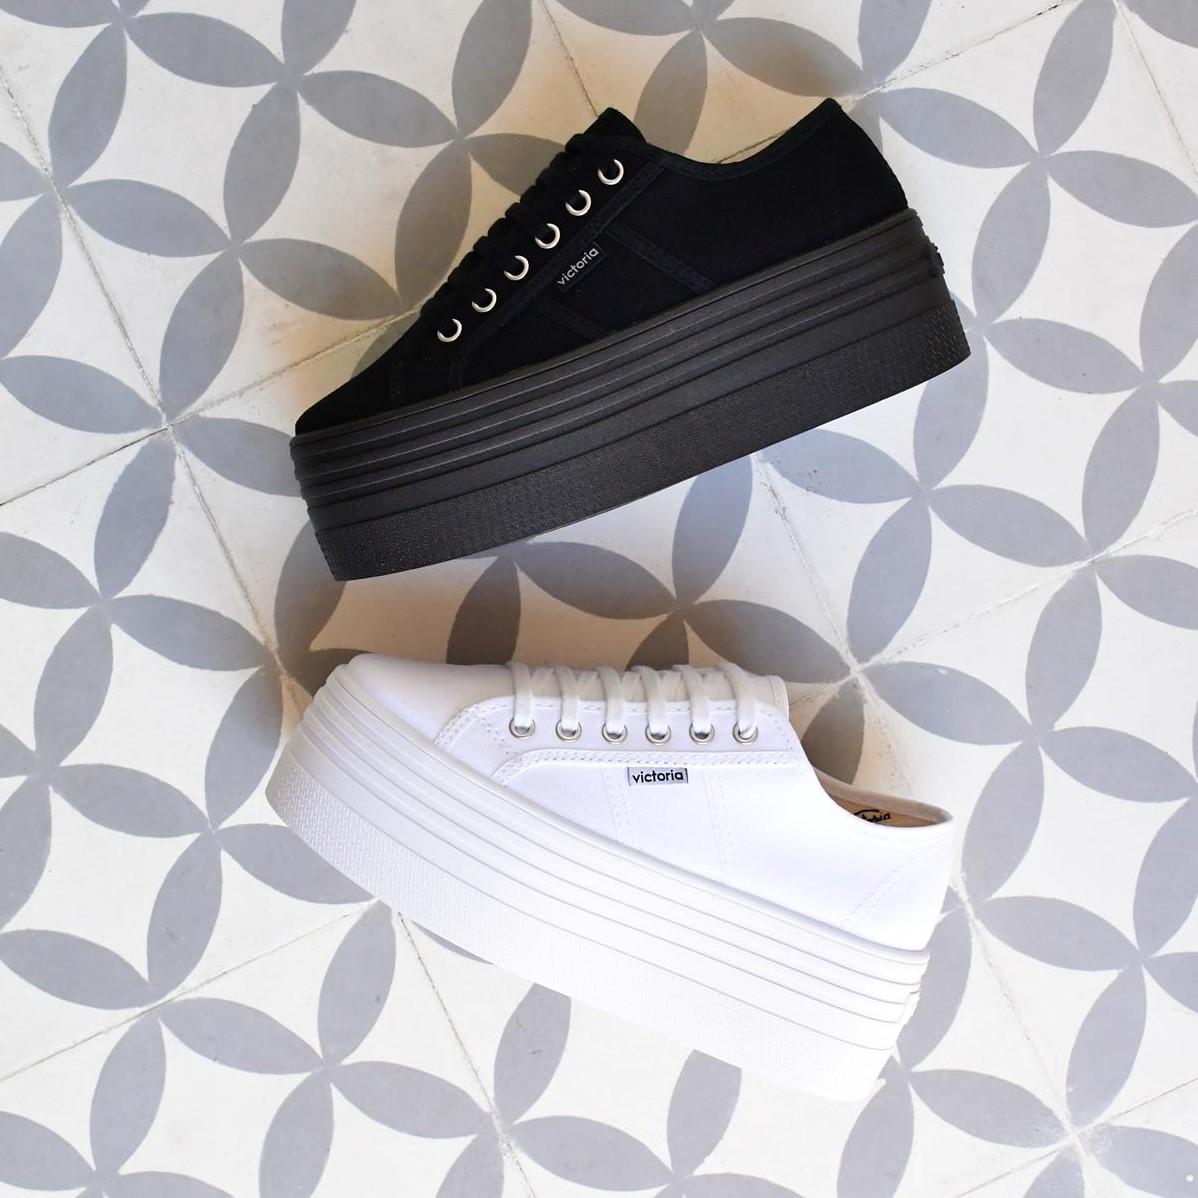 AmorShoes_105101-doble-platadorma-victoria-blucher-barcelona-lona-blanca-105101-HOME